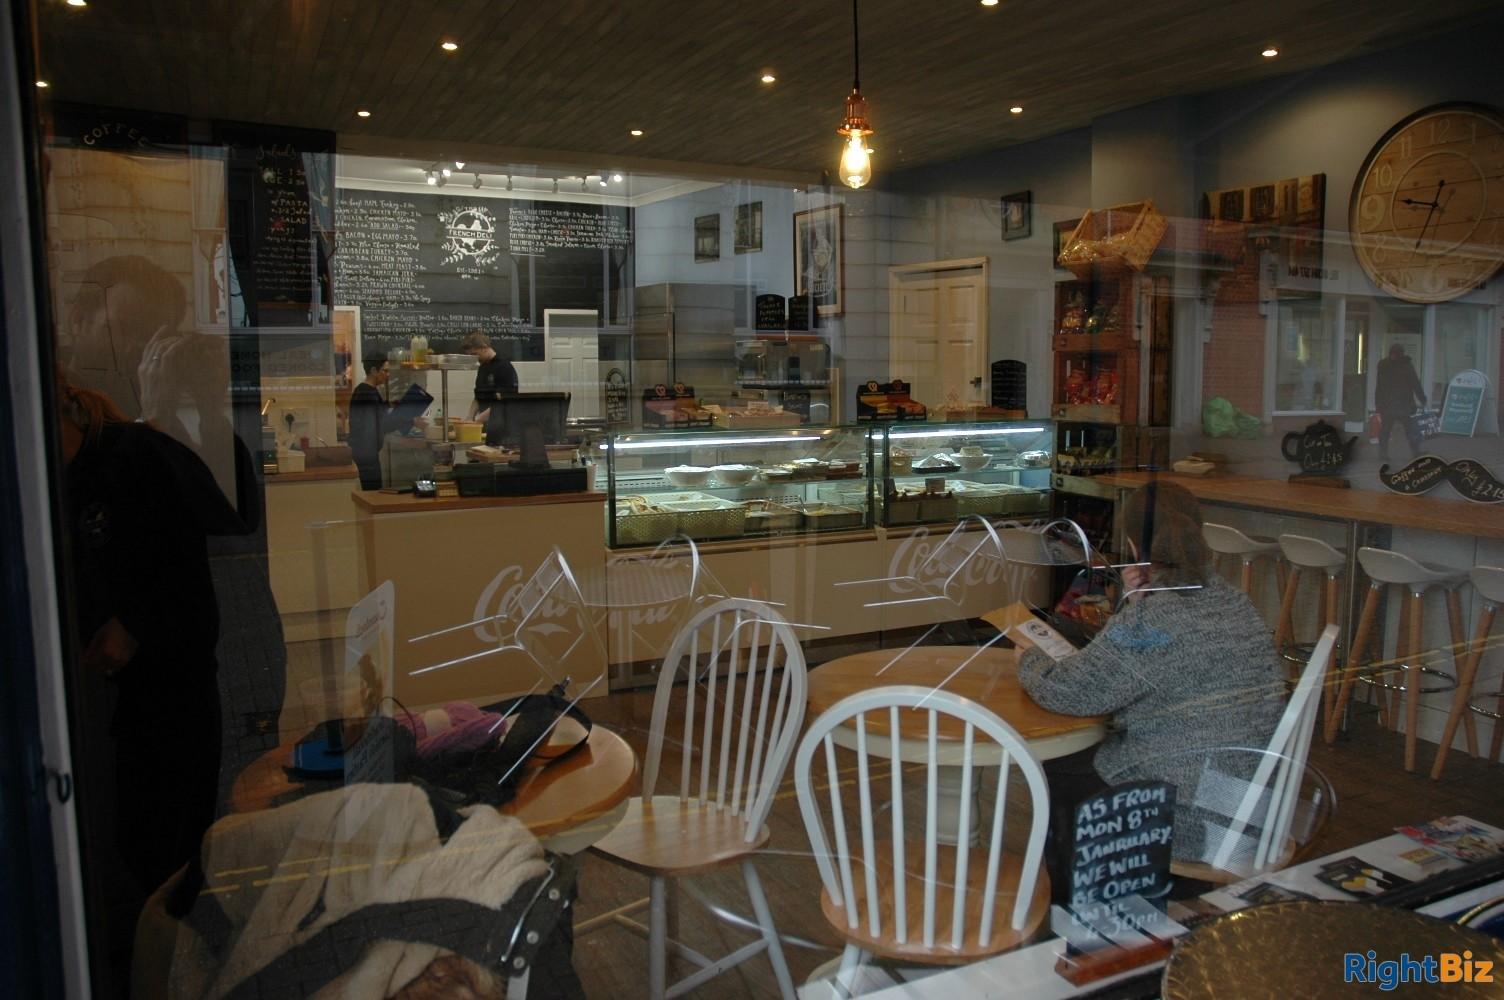 Premium Sandwich Shop and Delicatessen in Stourbridge, West Midlands *Offers Invited* - Image 2